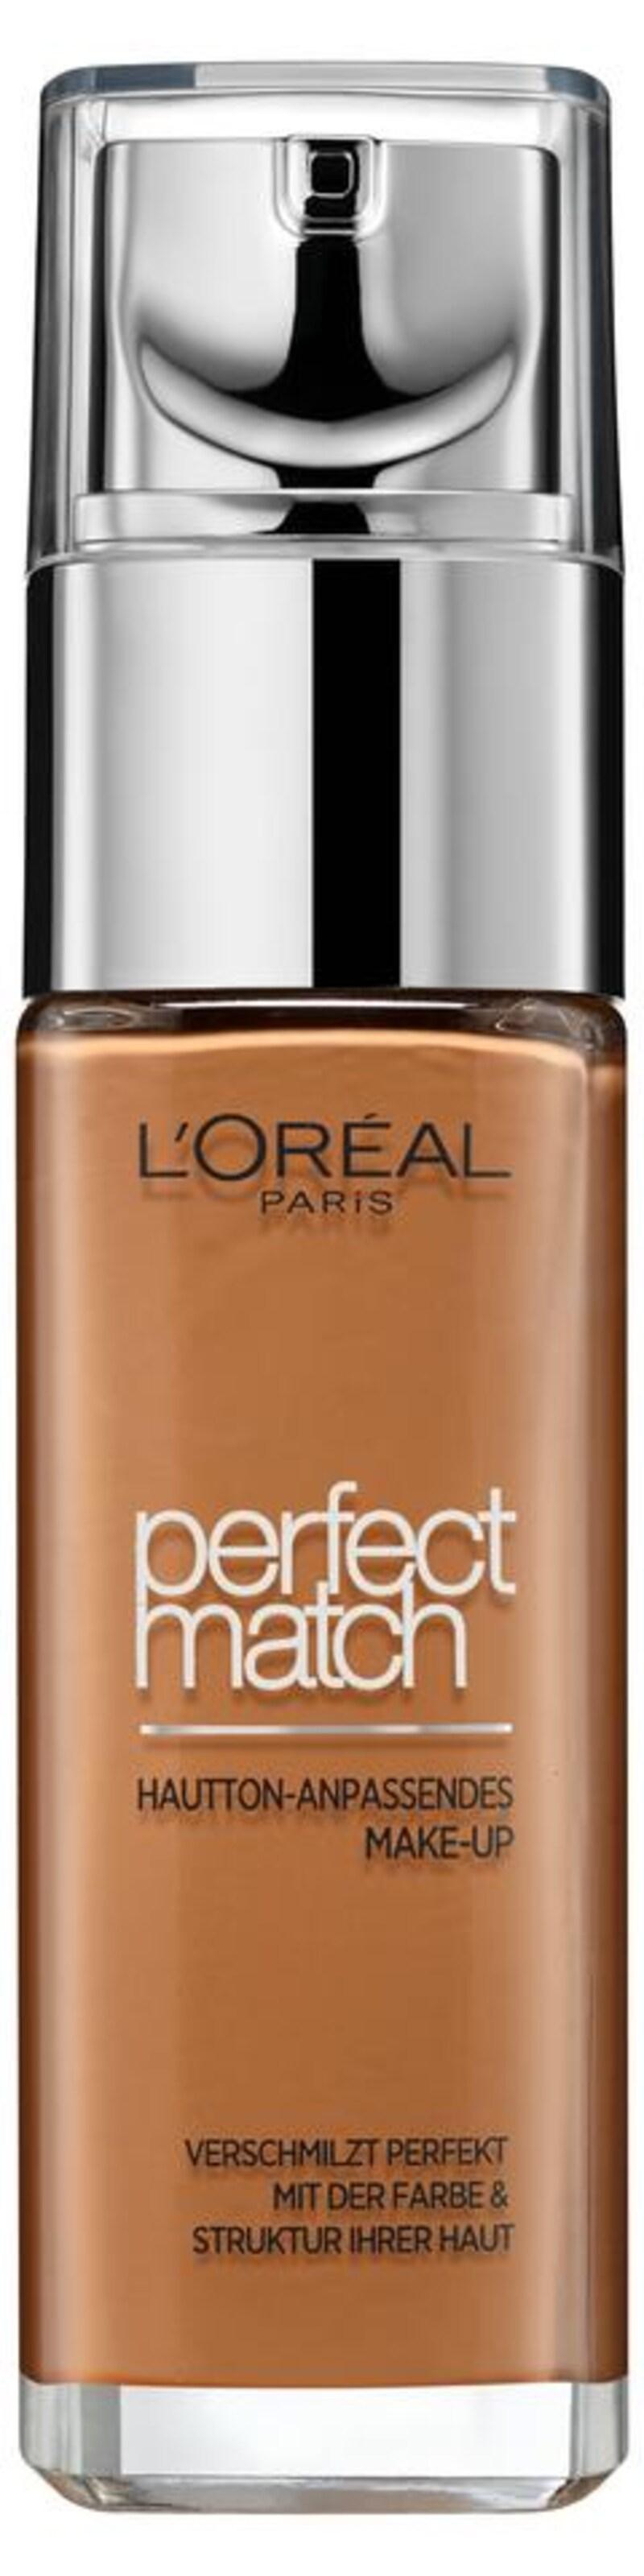 Braun Paris 'perfect Make In L'oréal Match' up wiOkulXZPT